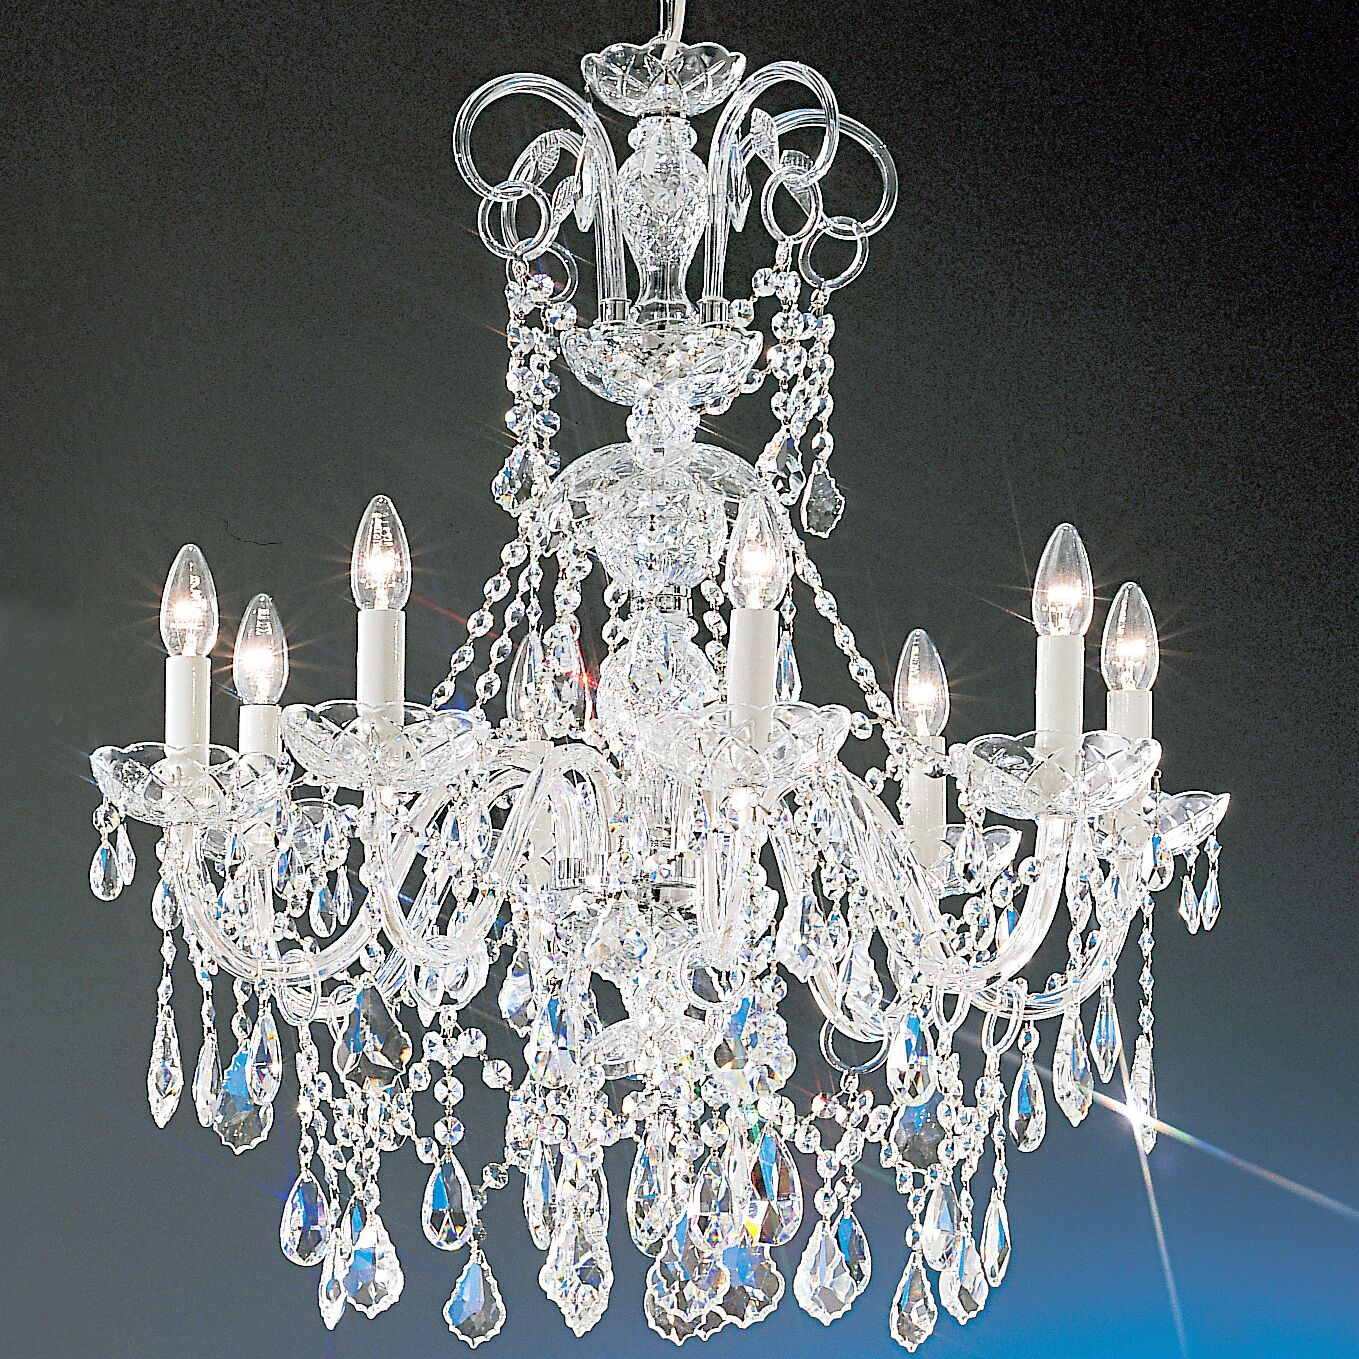 Bohemia 8-Light Candle Style Chandelier Crystal Type: Swarovski Spectra, Finish: 24K Gold Plate